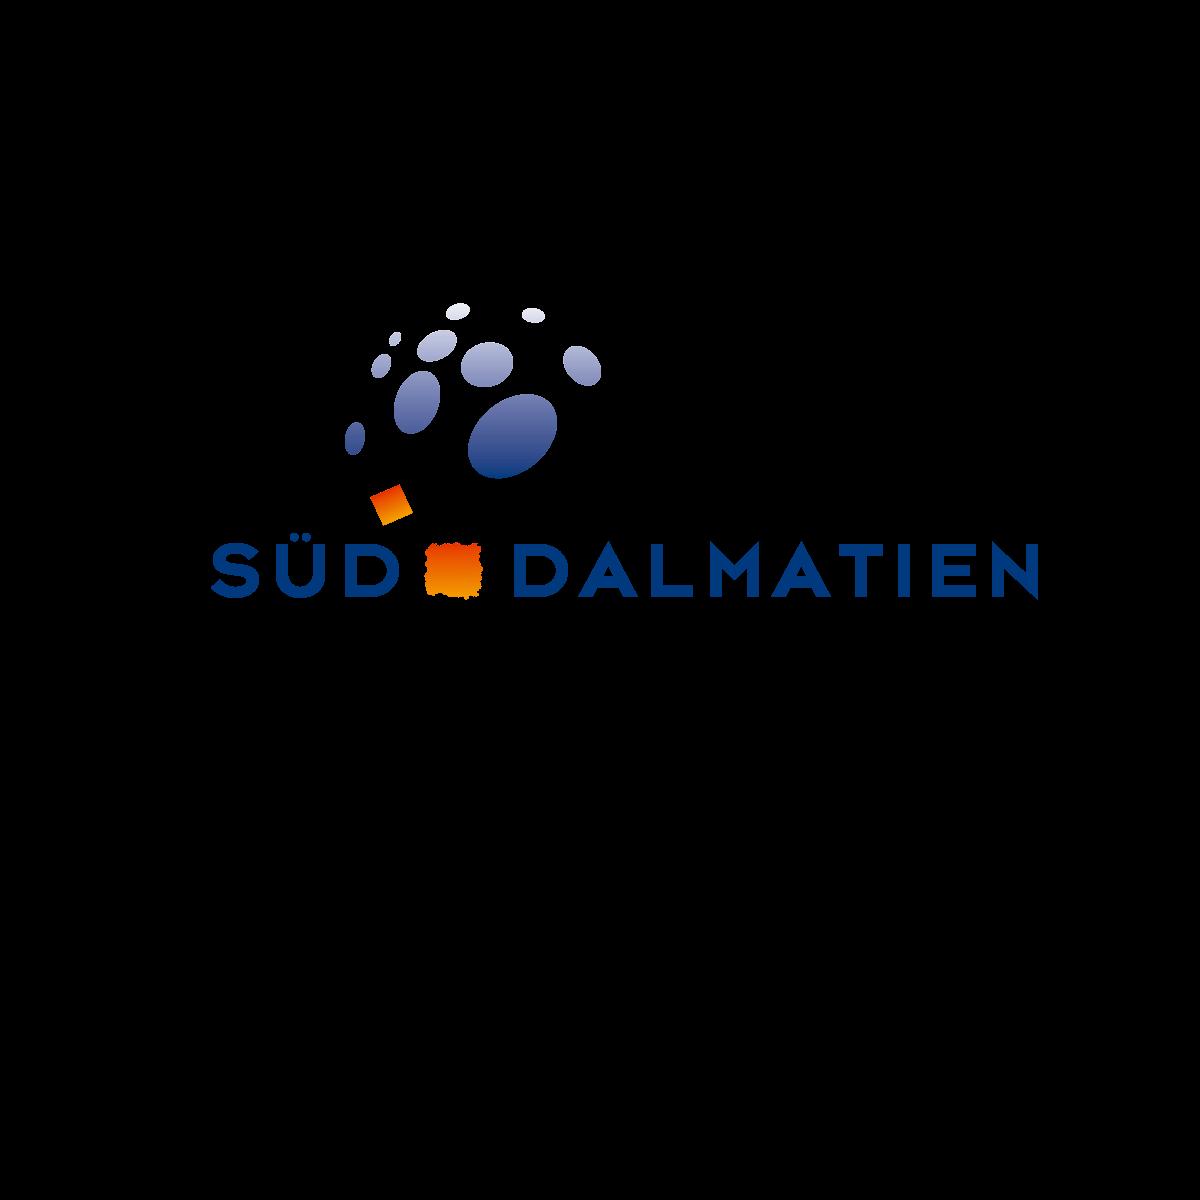 intermar-marketing-corporate-design-süd-dalmatien-logo.png